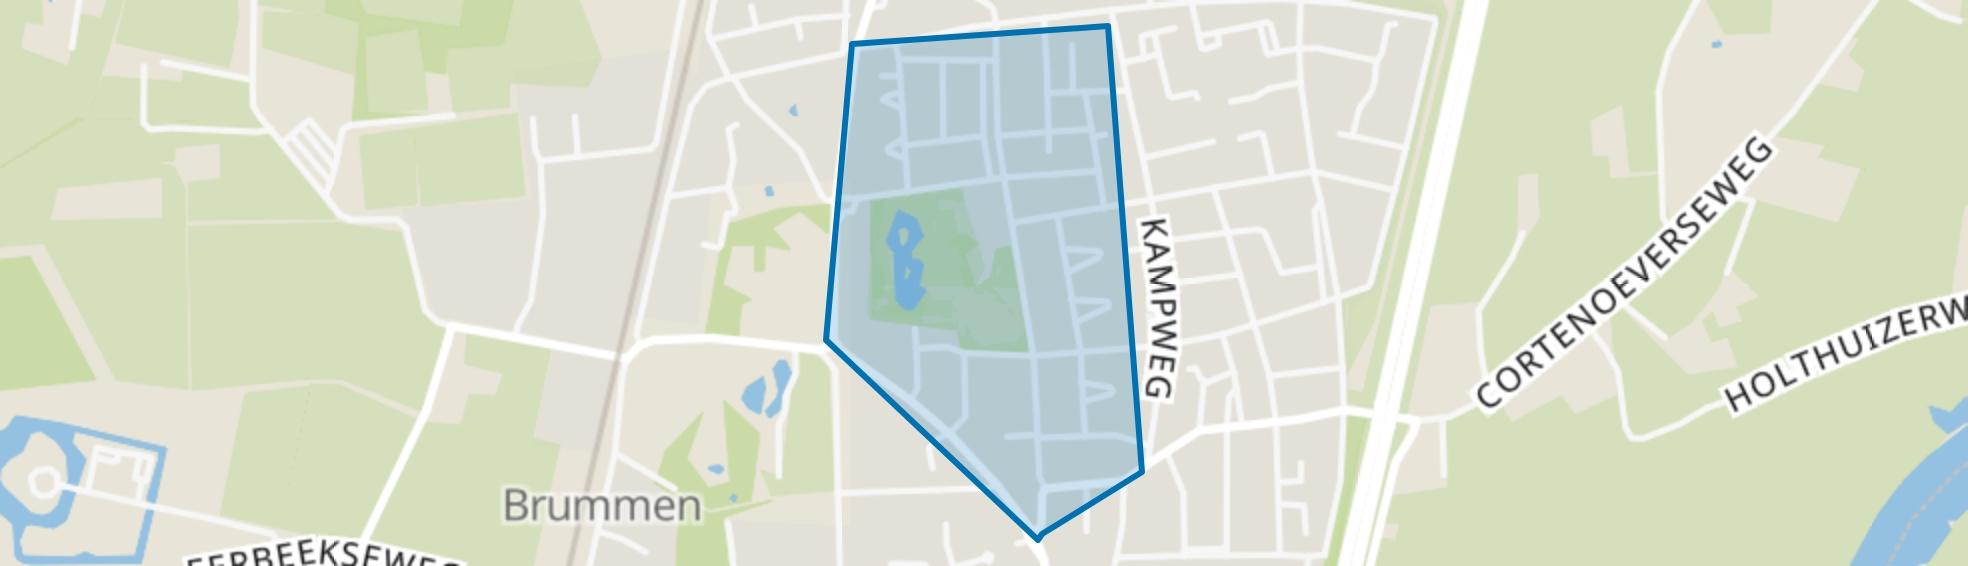 Brummense Enk West, Brummen map